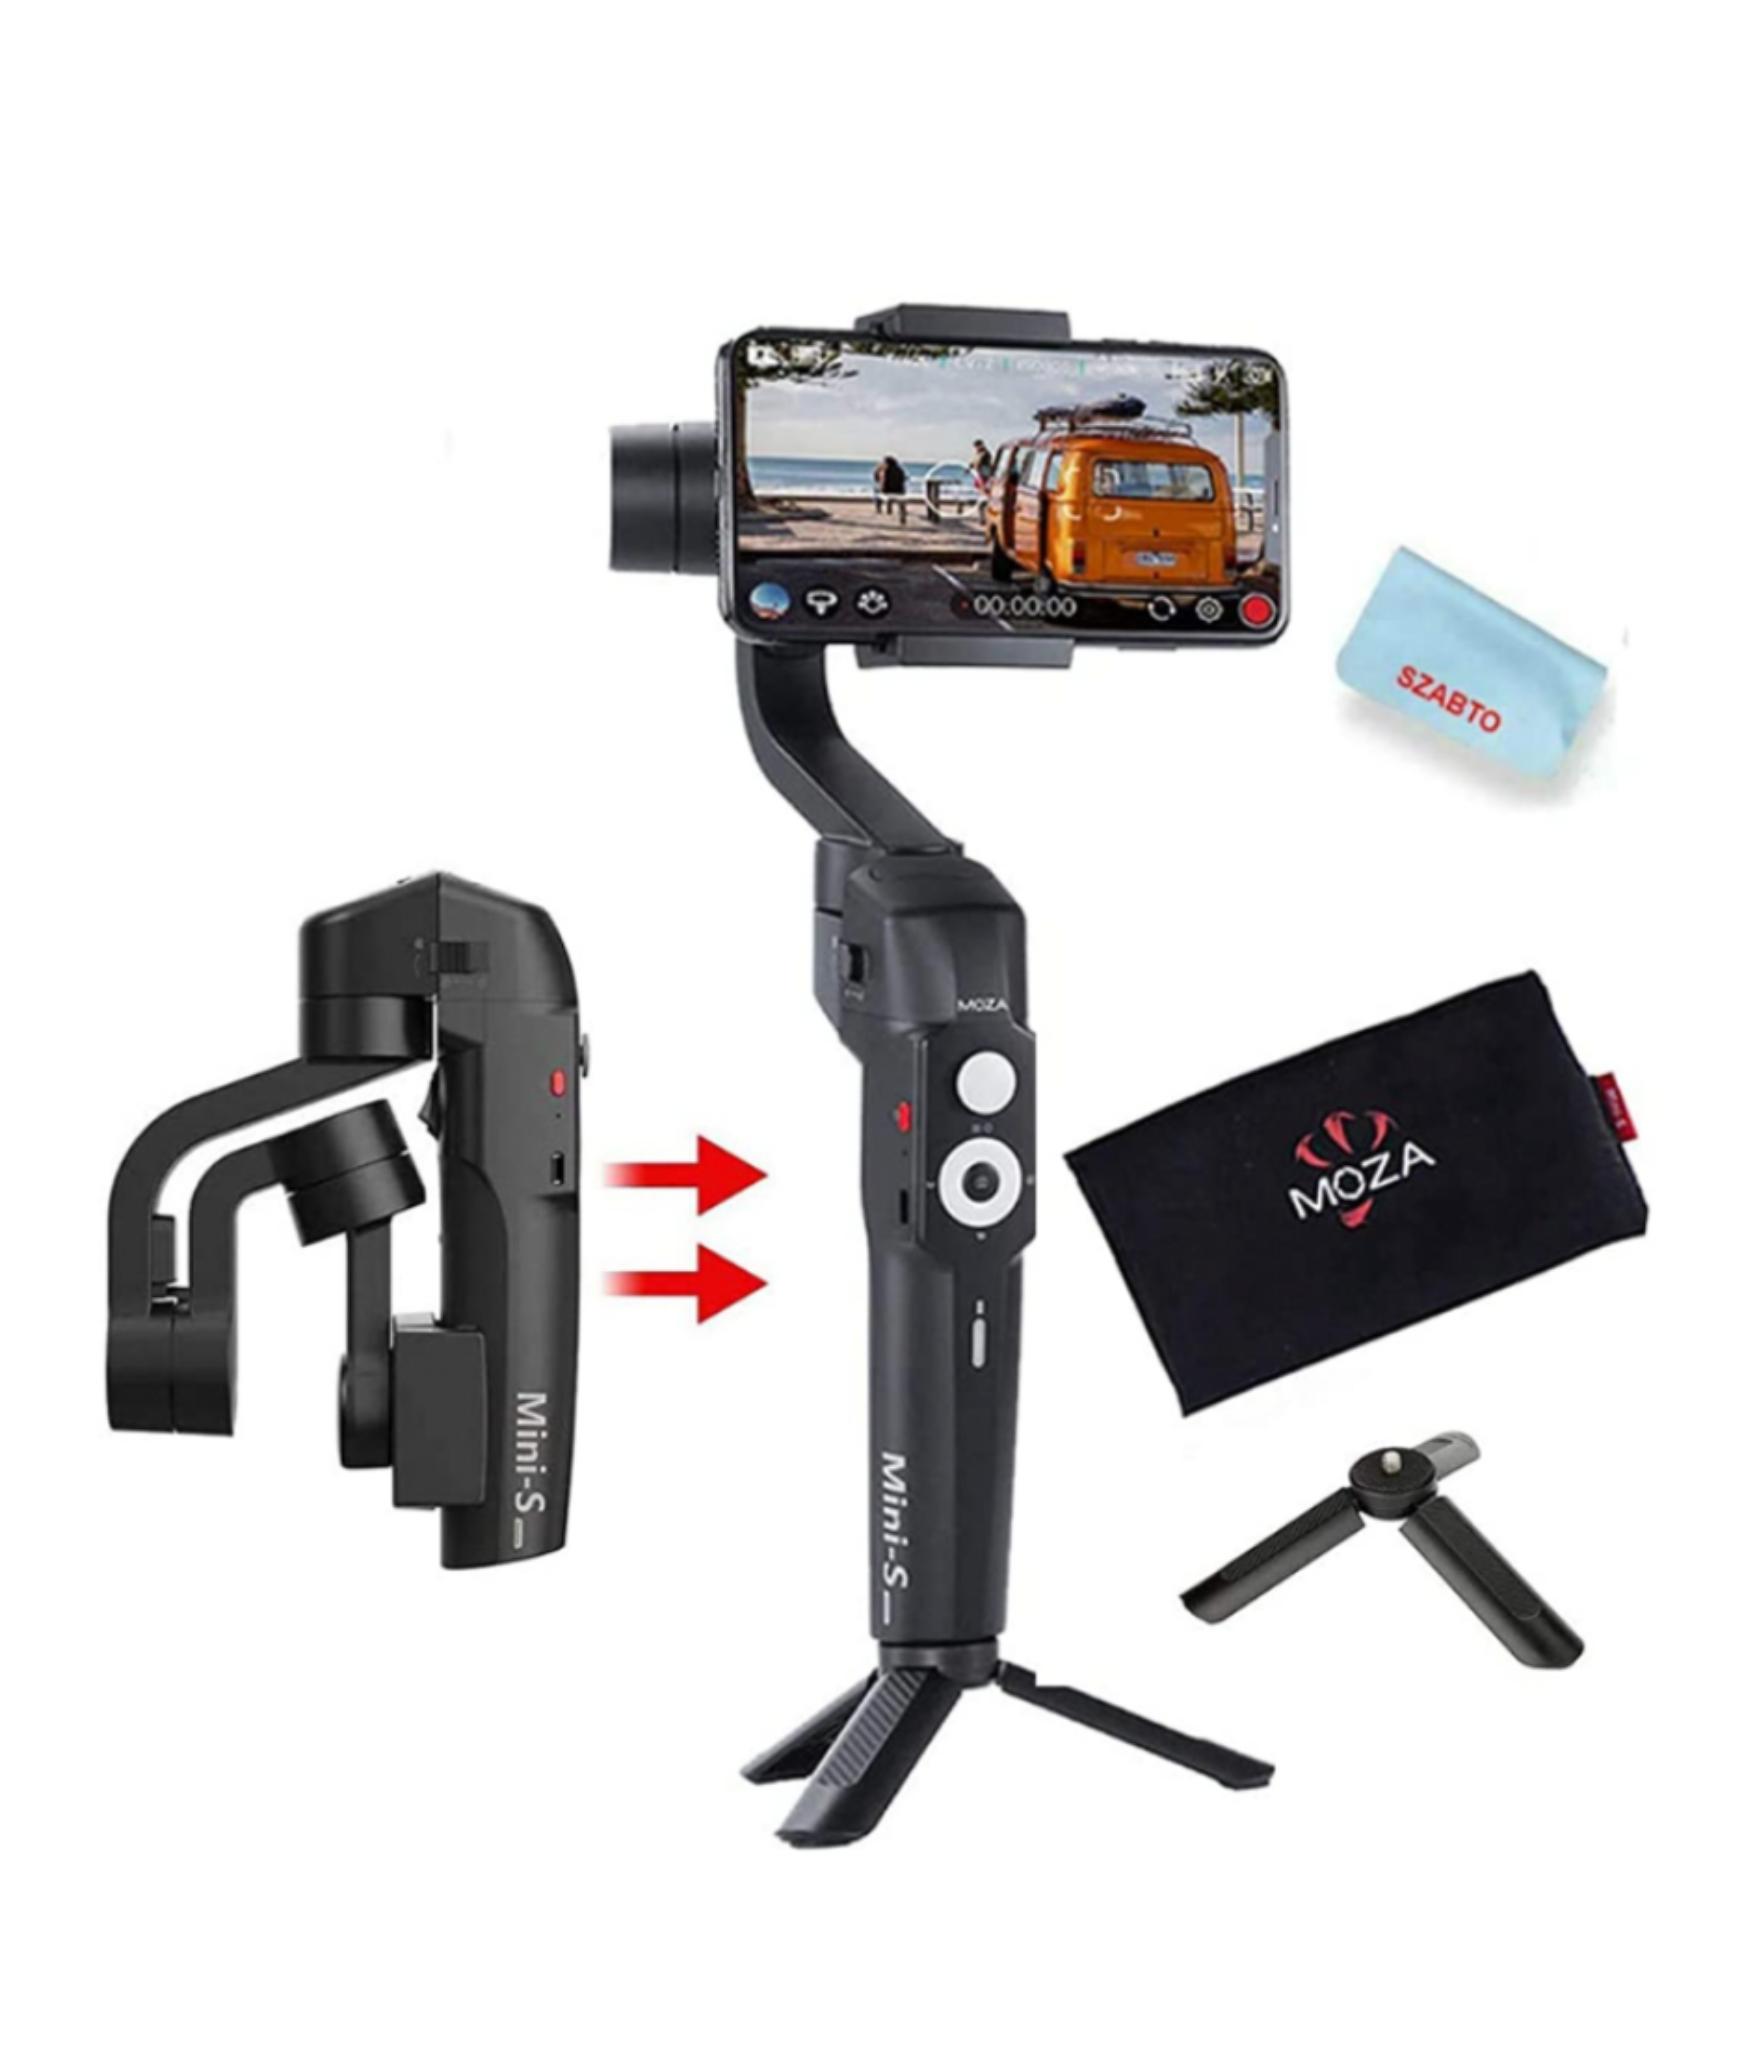 Stabilisateur Gudsen Moza Mini S pour smartphone - Noir (camforpro.com)